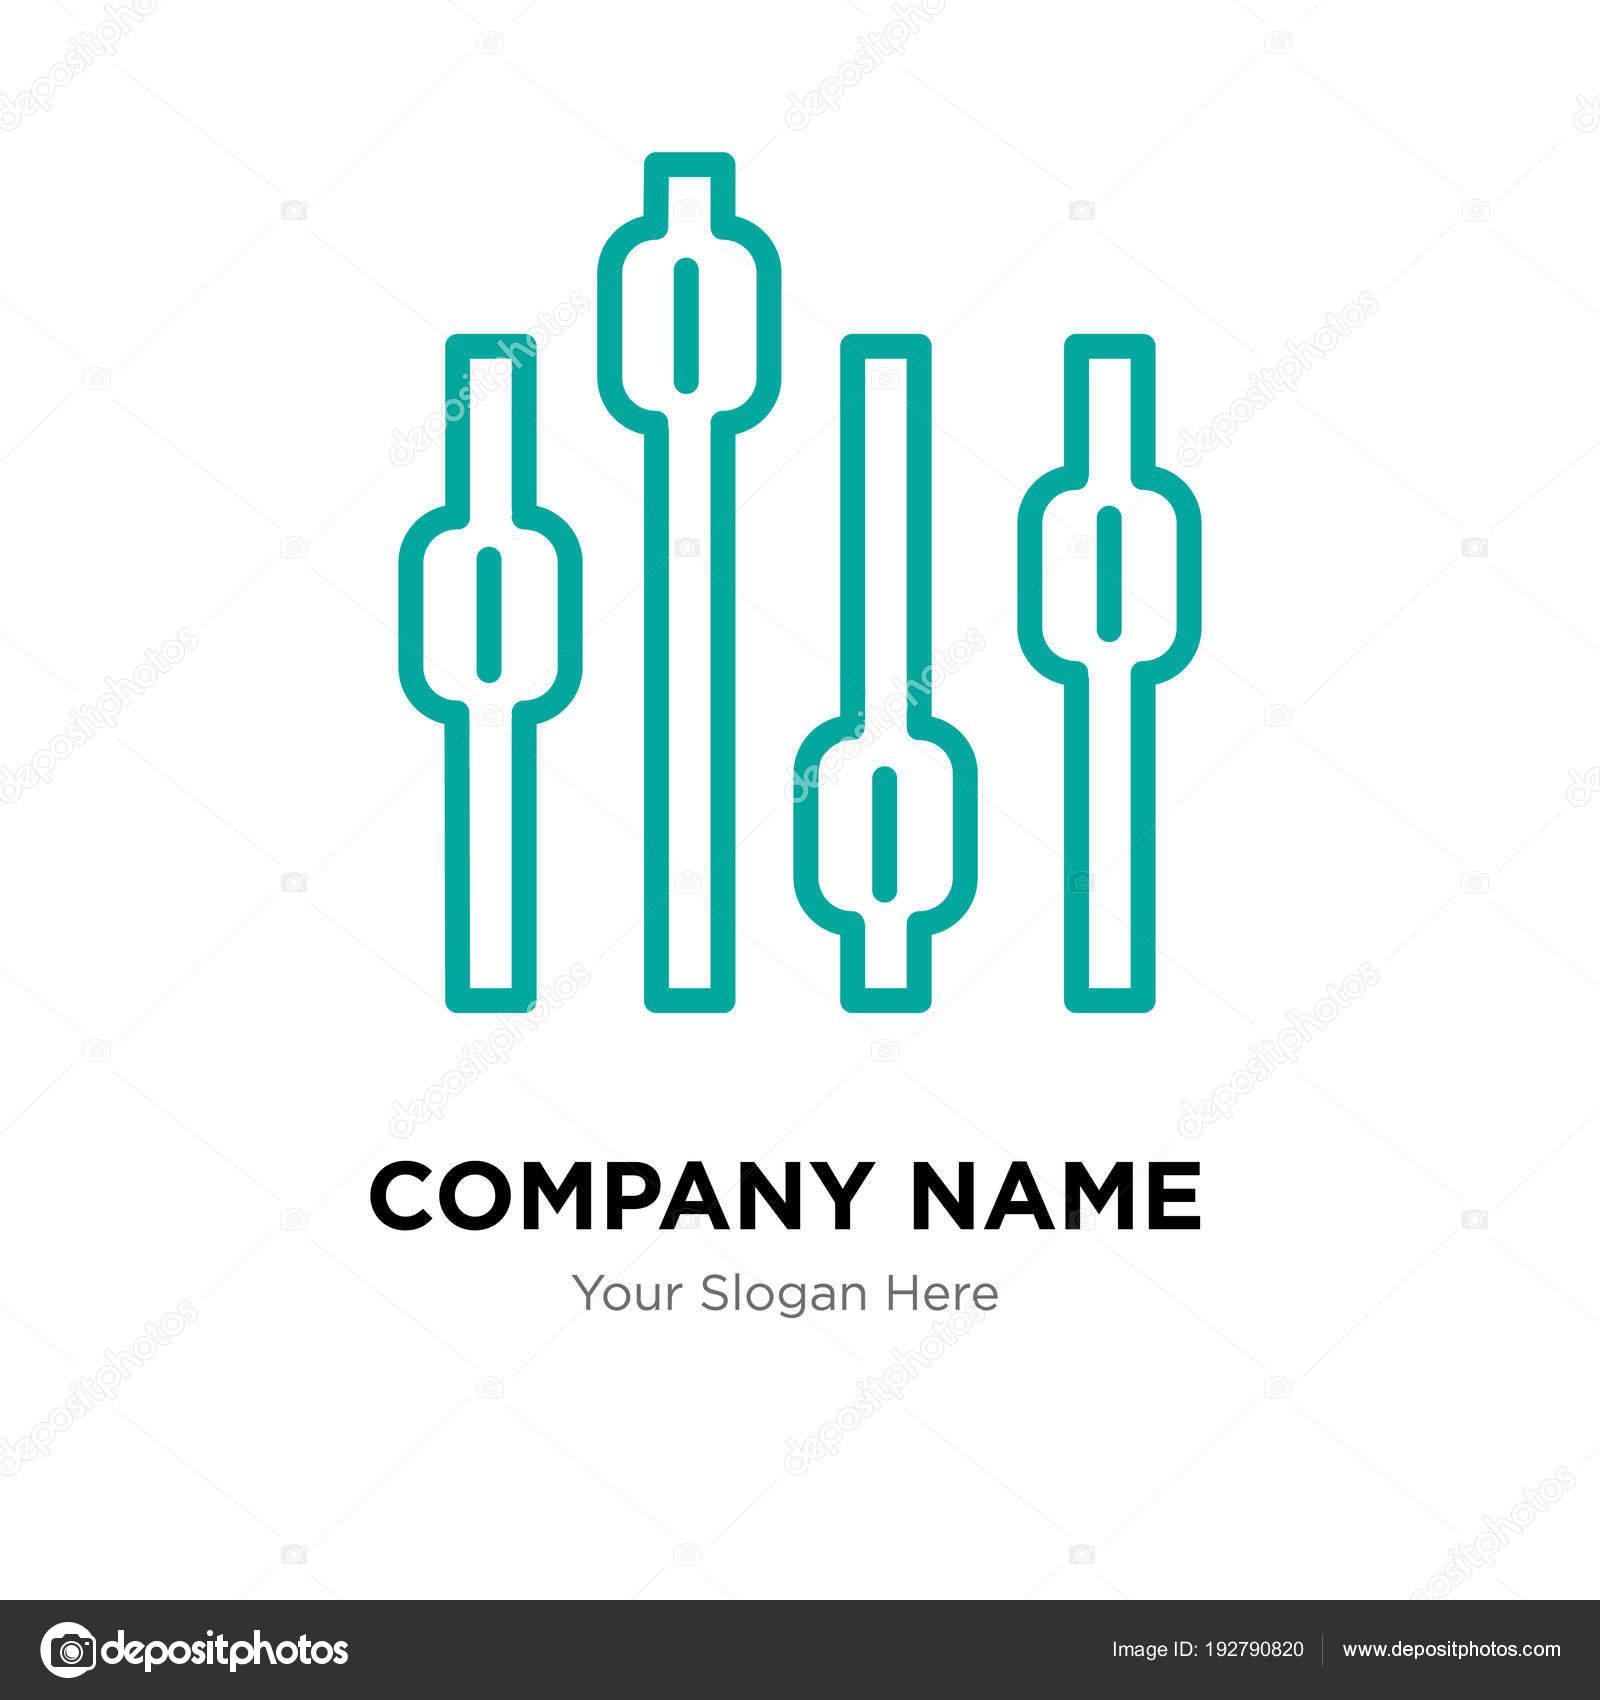 Box plot chart company logo design template — Stock Vector ...